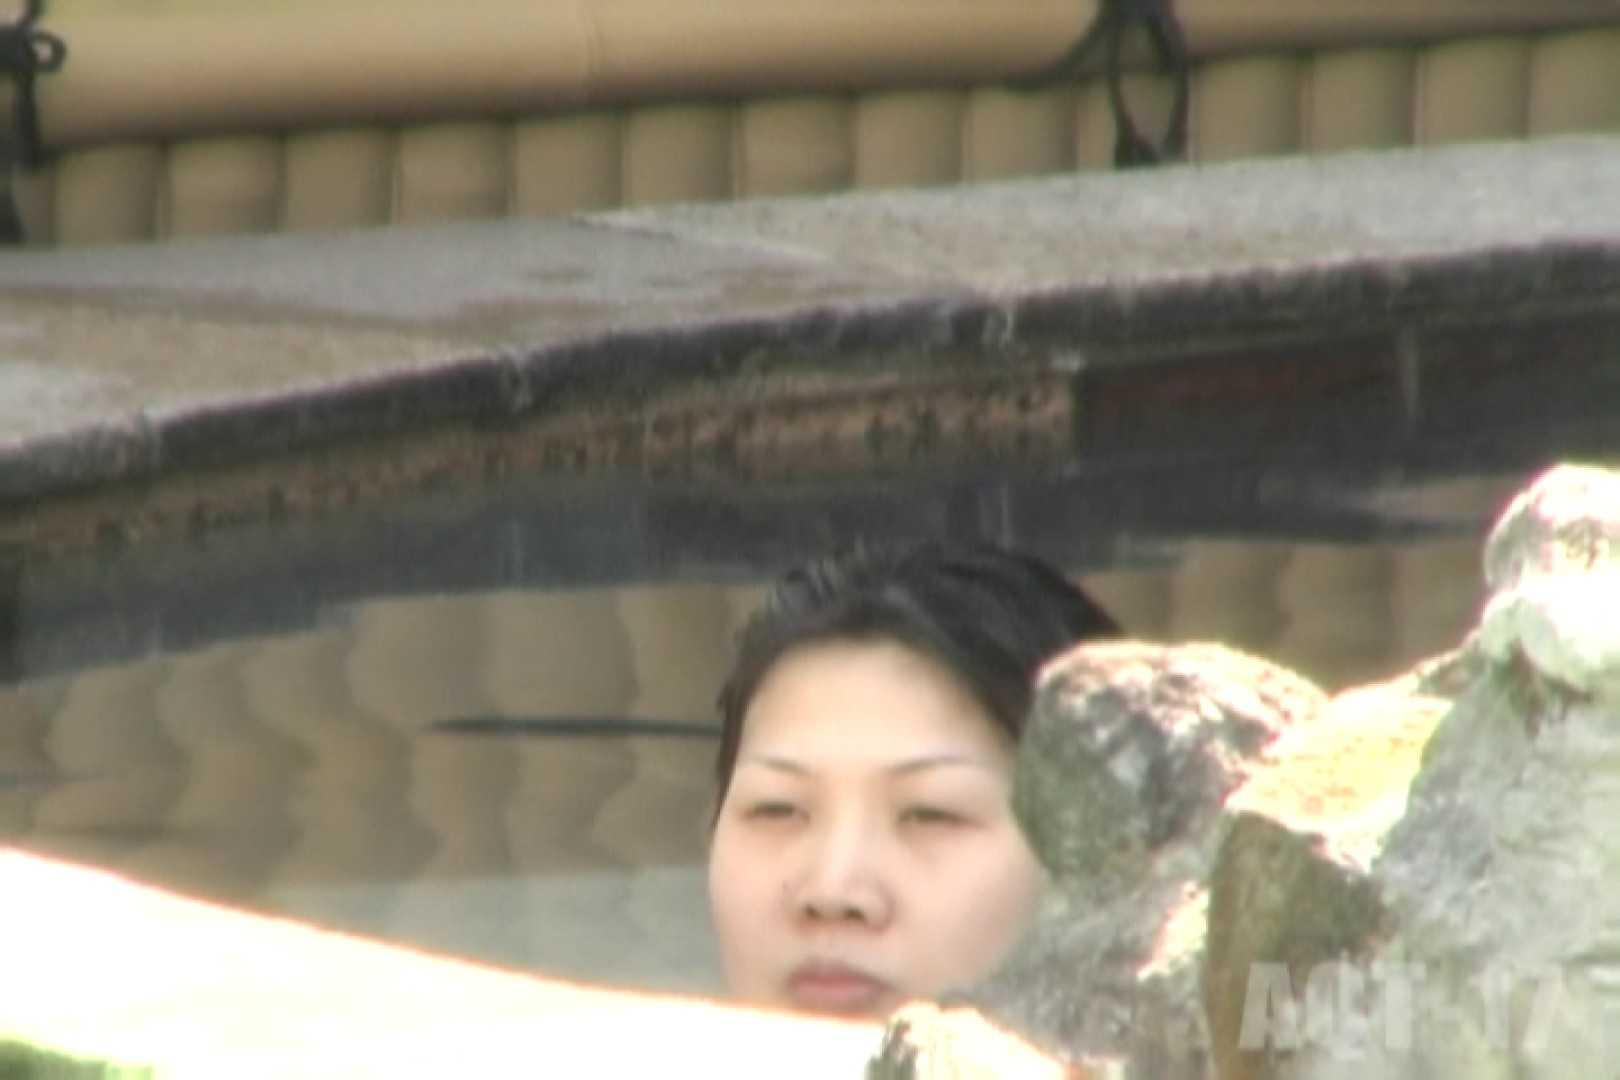 Aquaな露天風呂Vol.850 盗撮シリーズ | 露天風呂編  88PIX 31